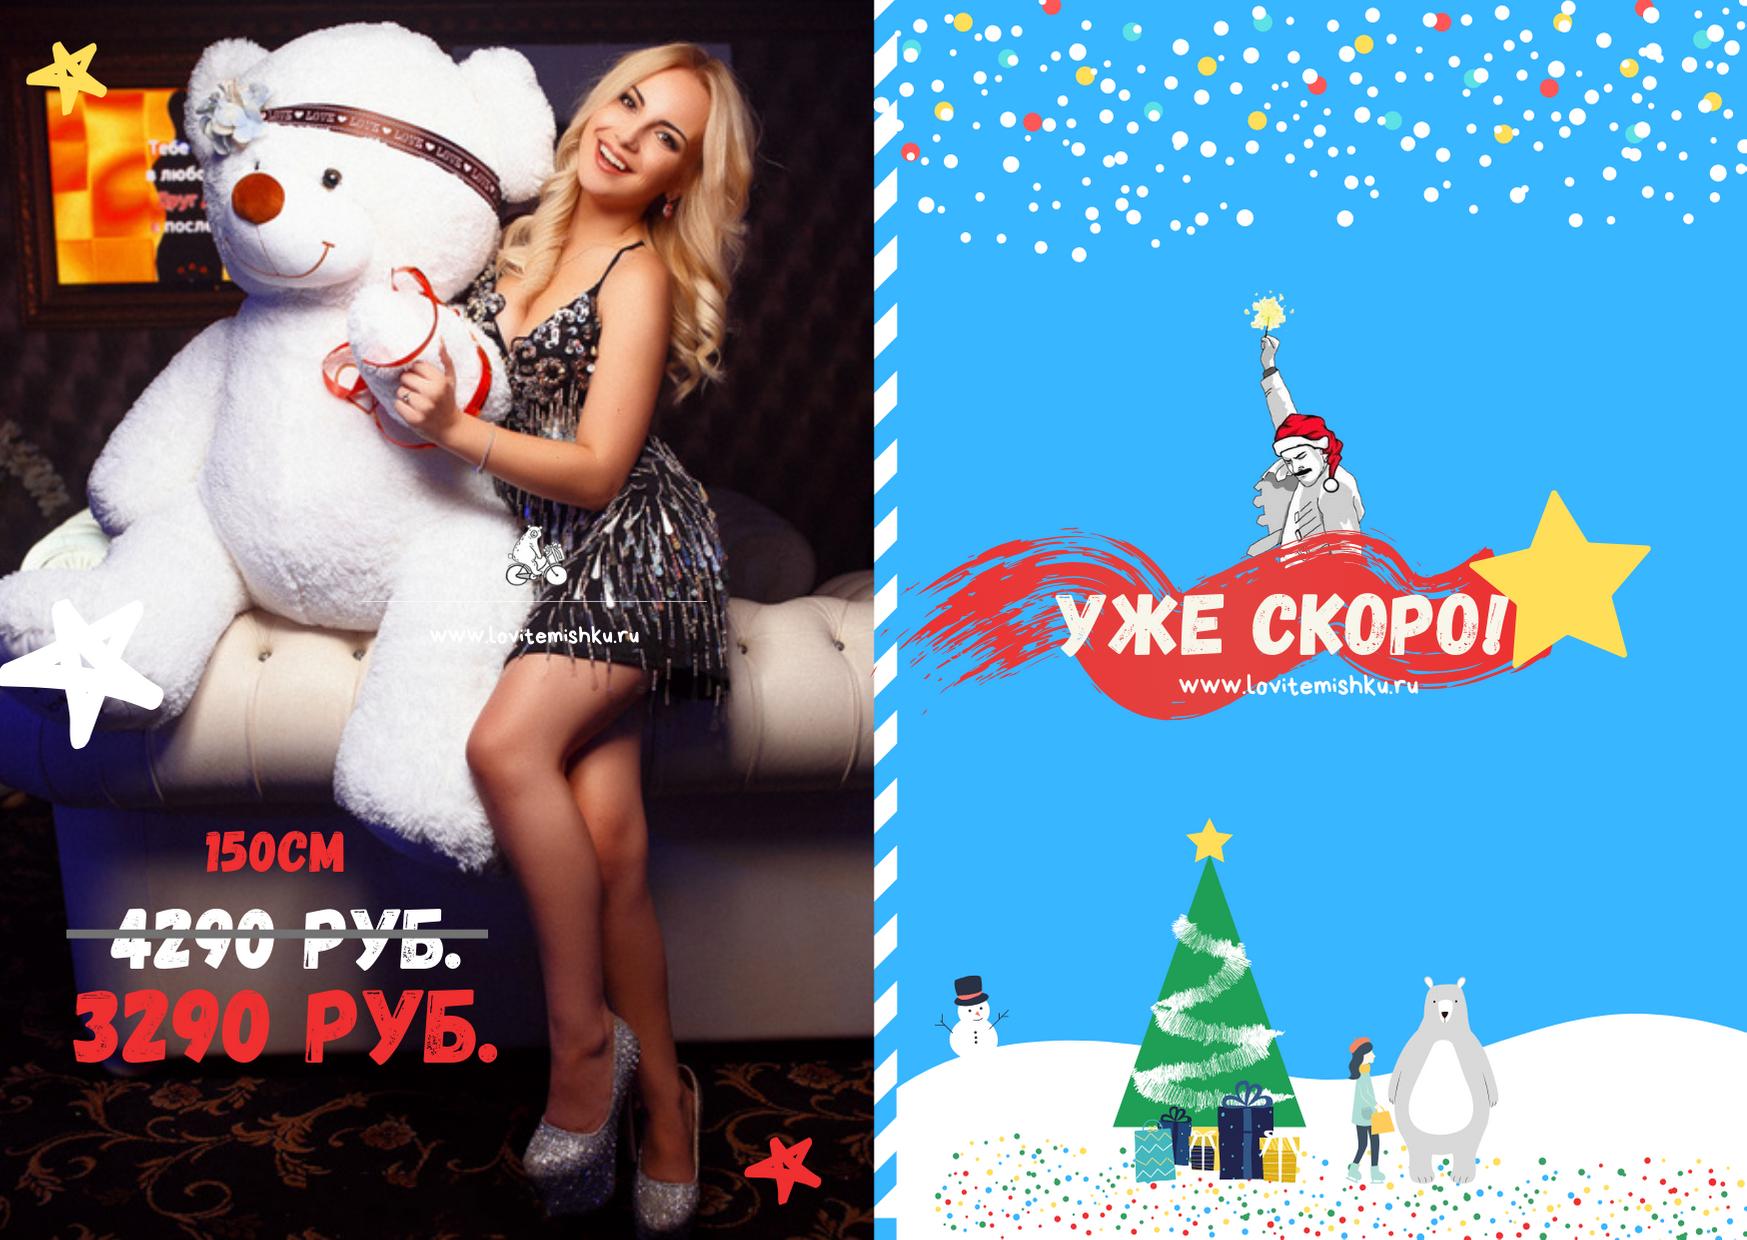 http://lovitemishku.ru/images/upload/plyushevyj-medvedi%20tula%207.png